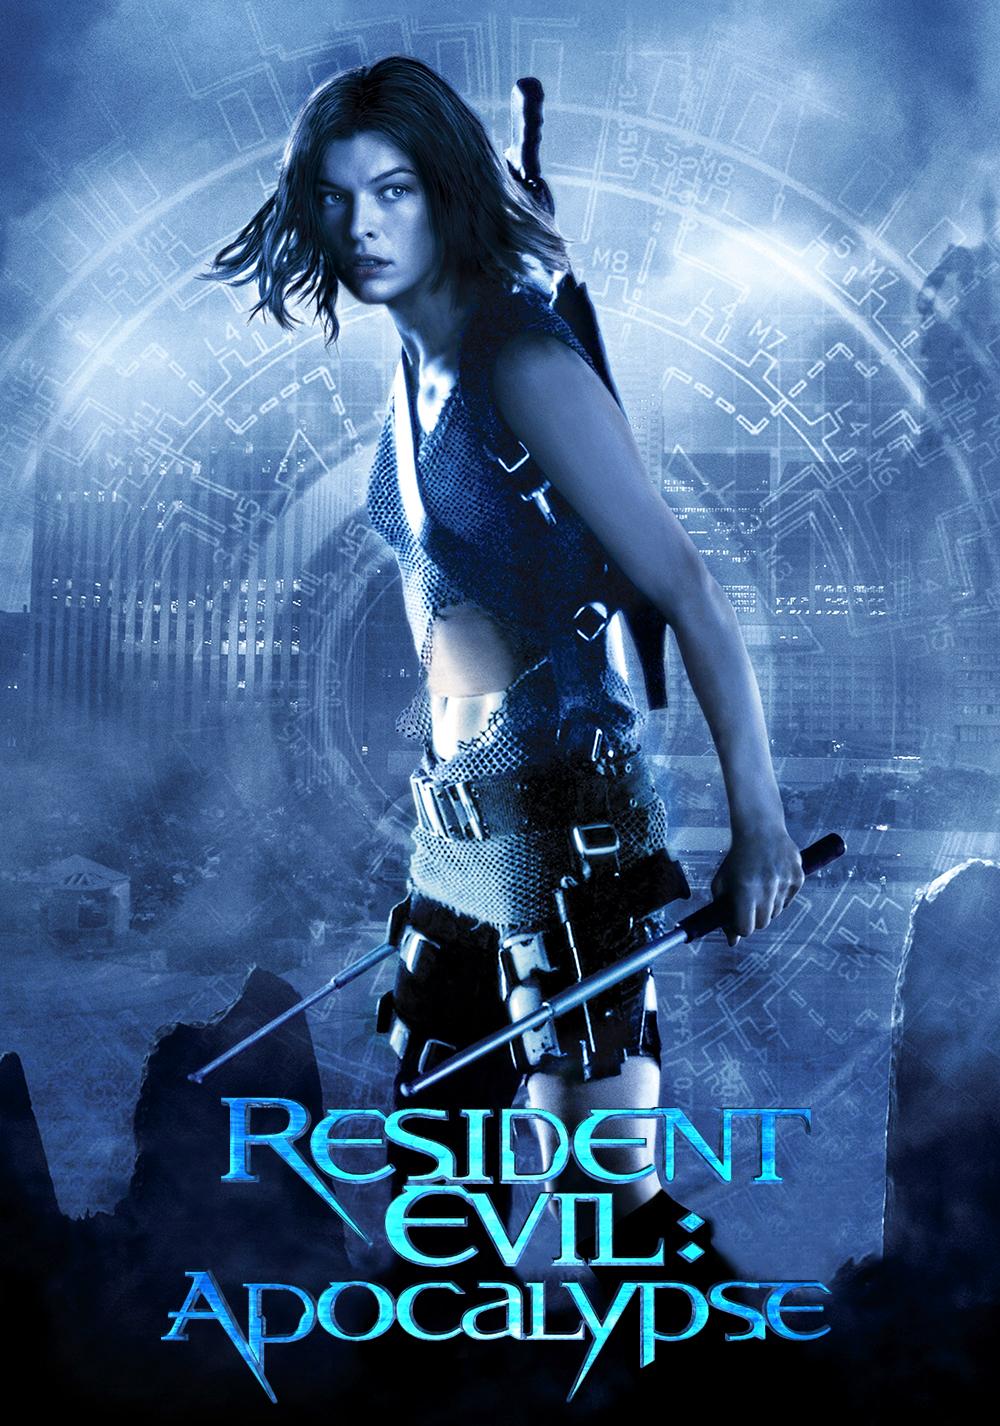 Resident Evil: Apocalypse : Movie fanart : fanart.tv